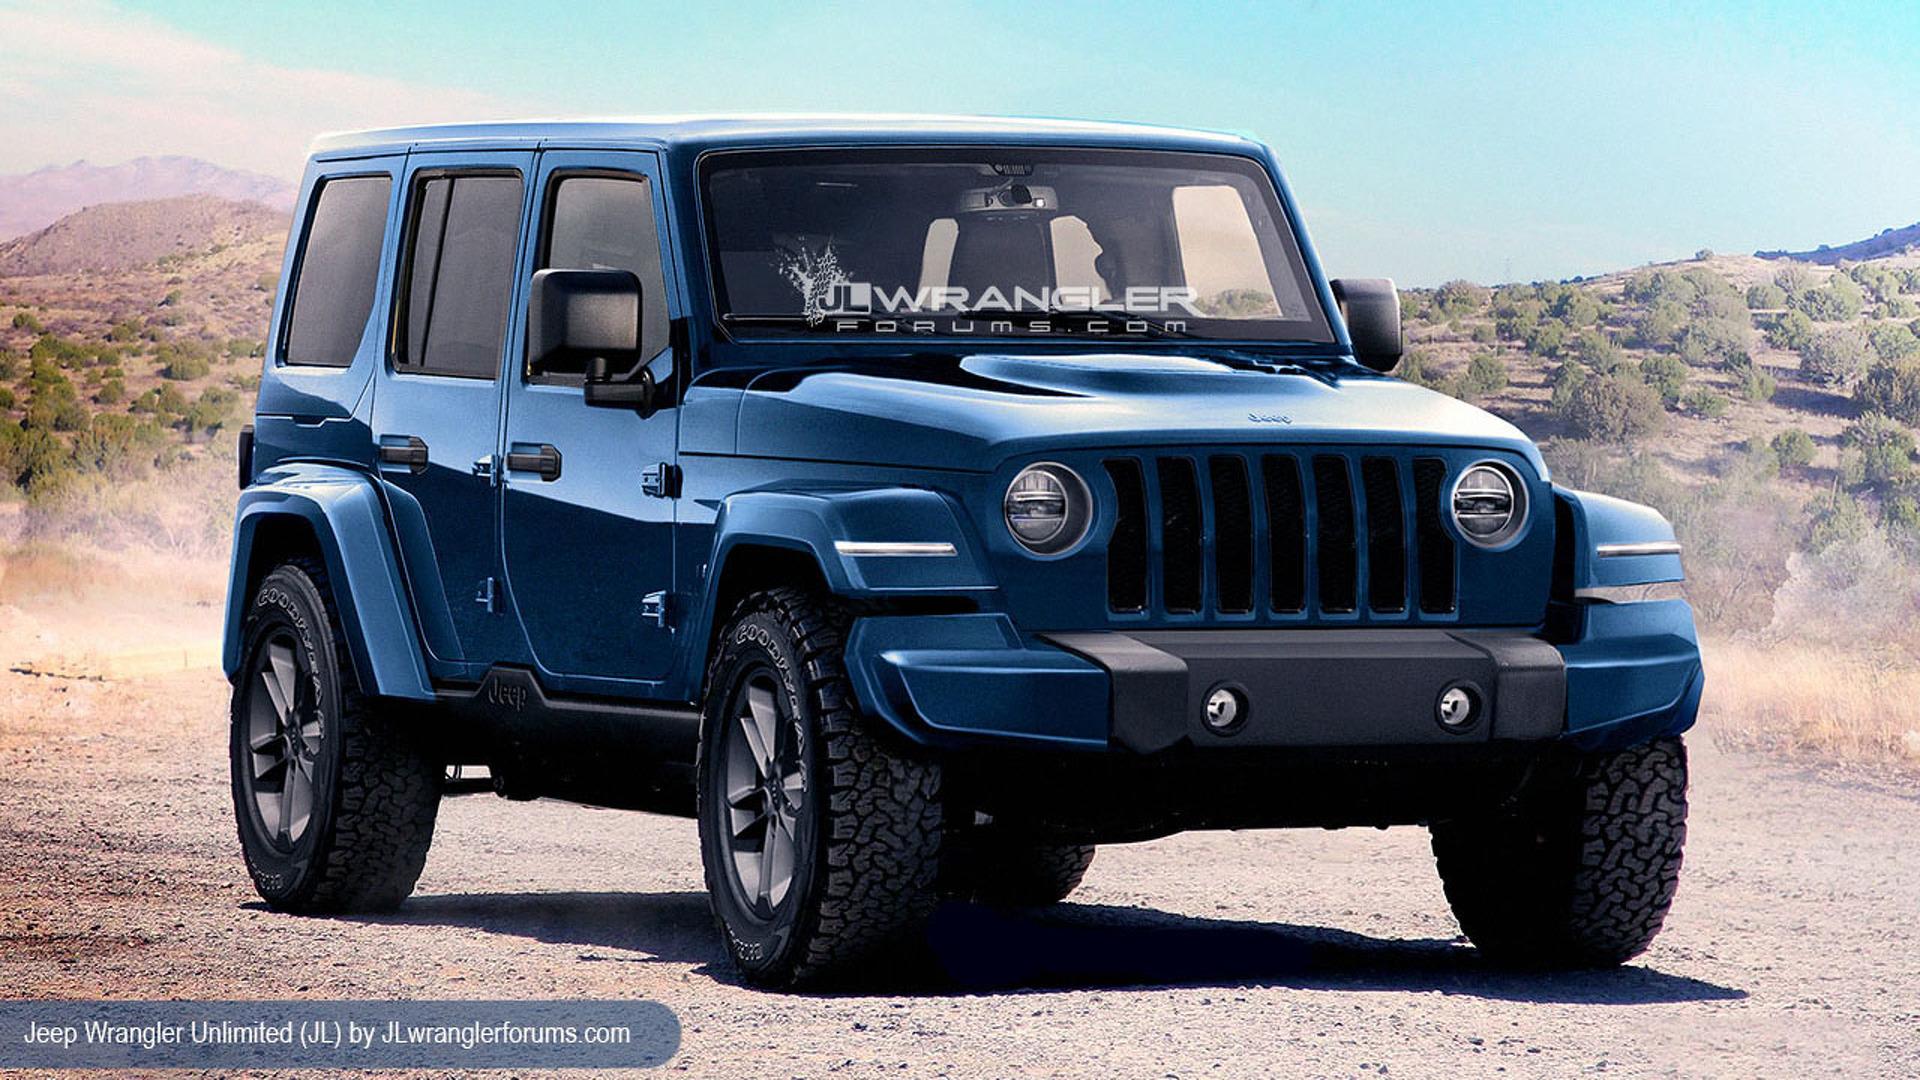 Next Gen Jeep Wrangler Production To Begin In November